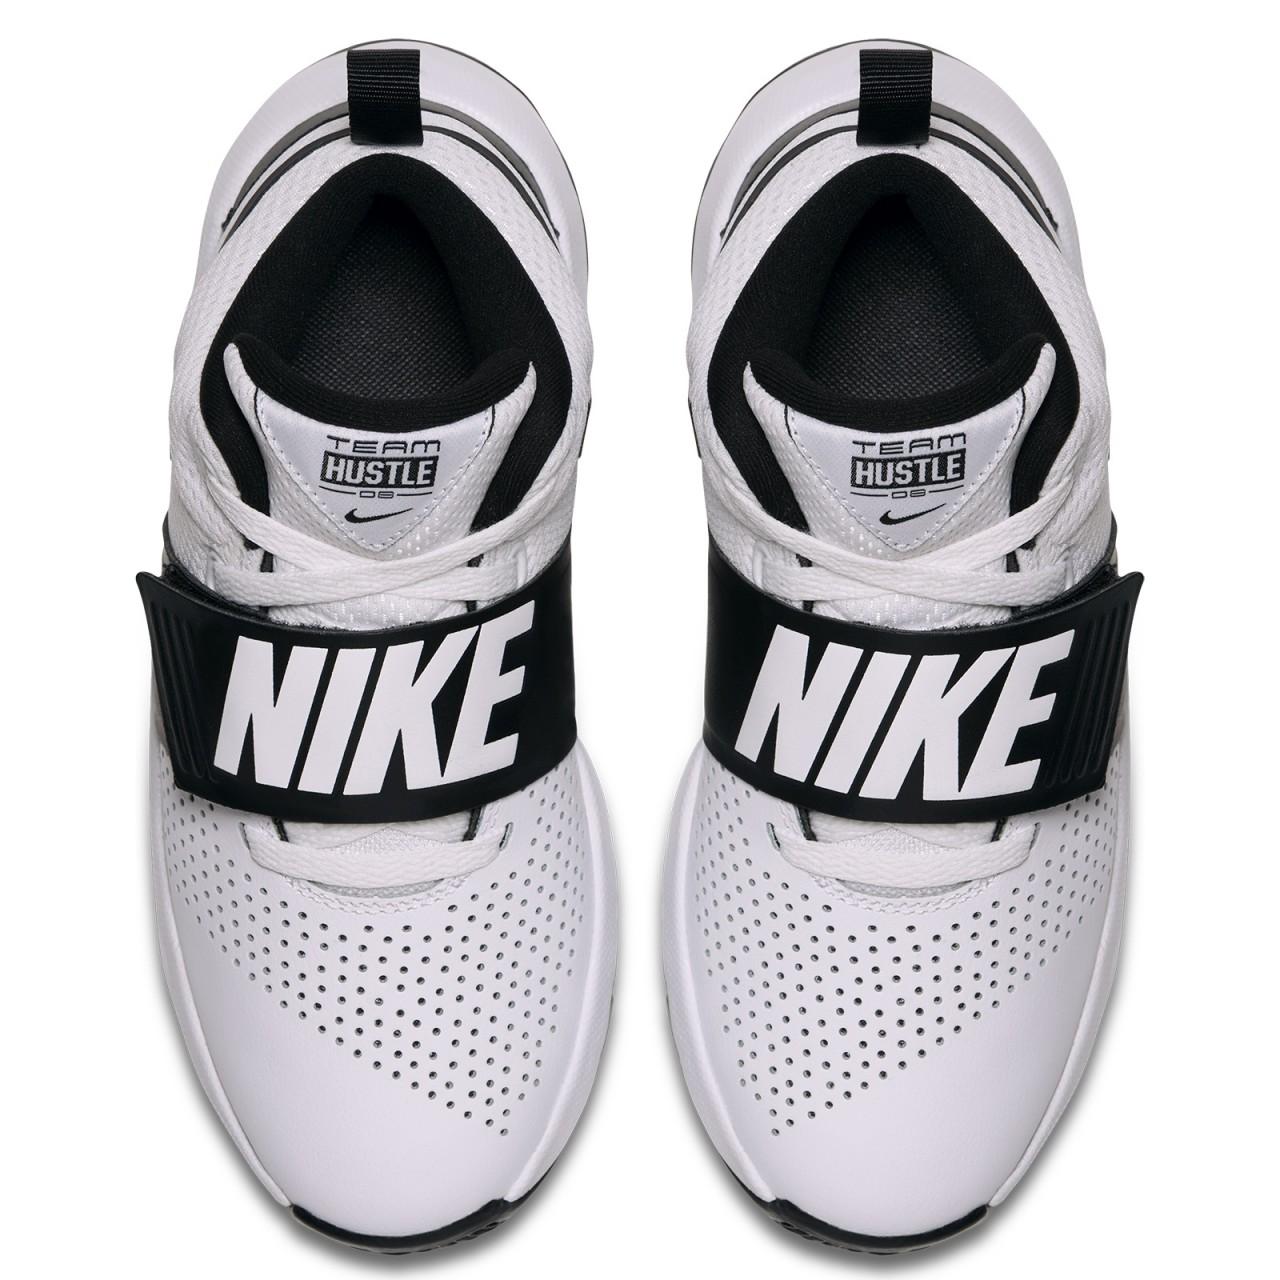 Hustle 881942 Calzature Basket Bimbo Lombardi D8 Team 100 Nike 5FqP7A1x